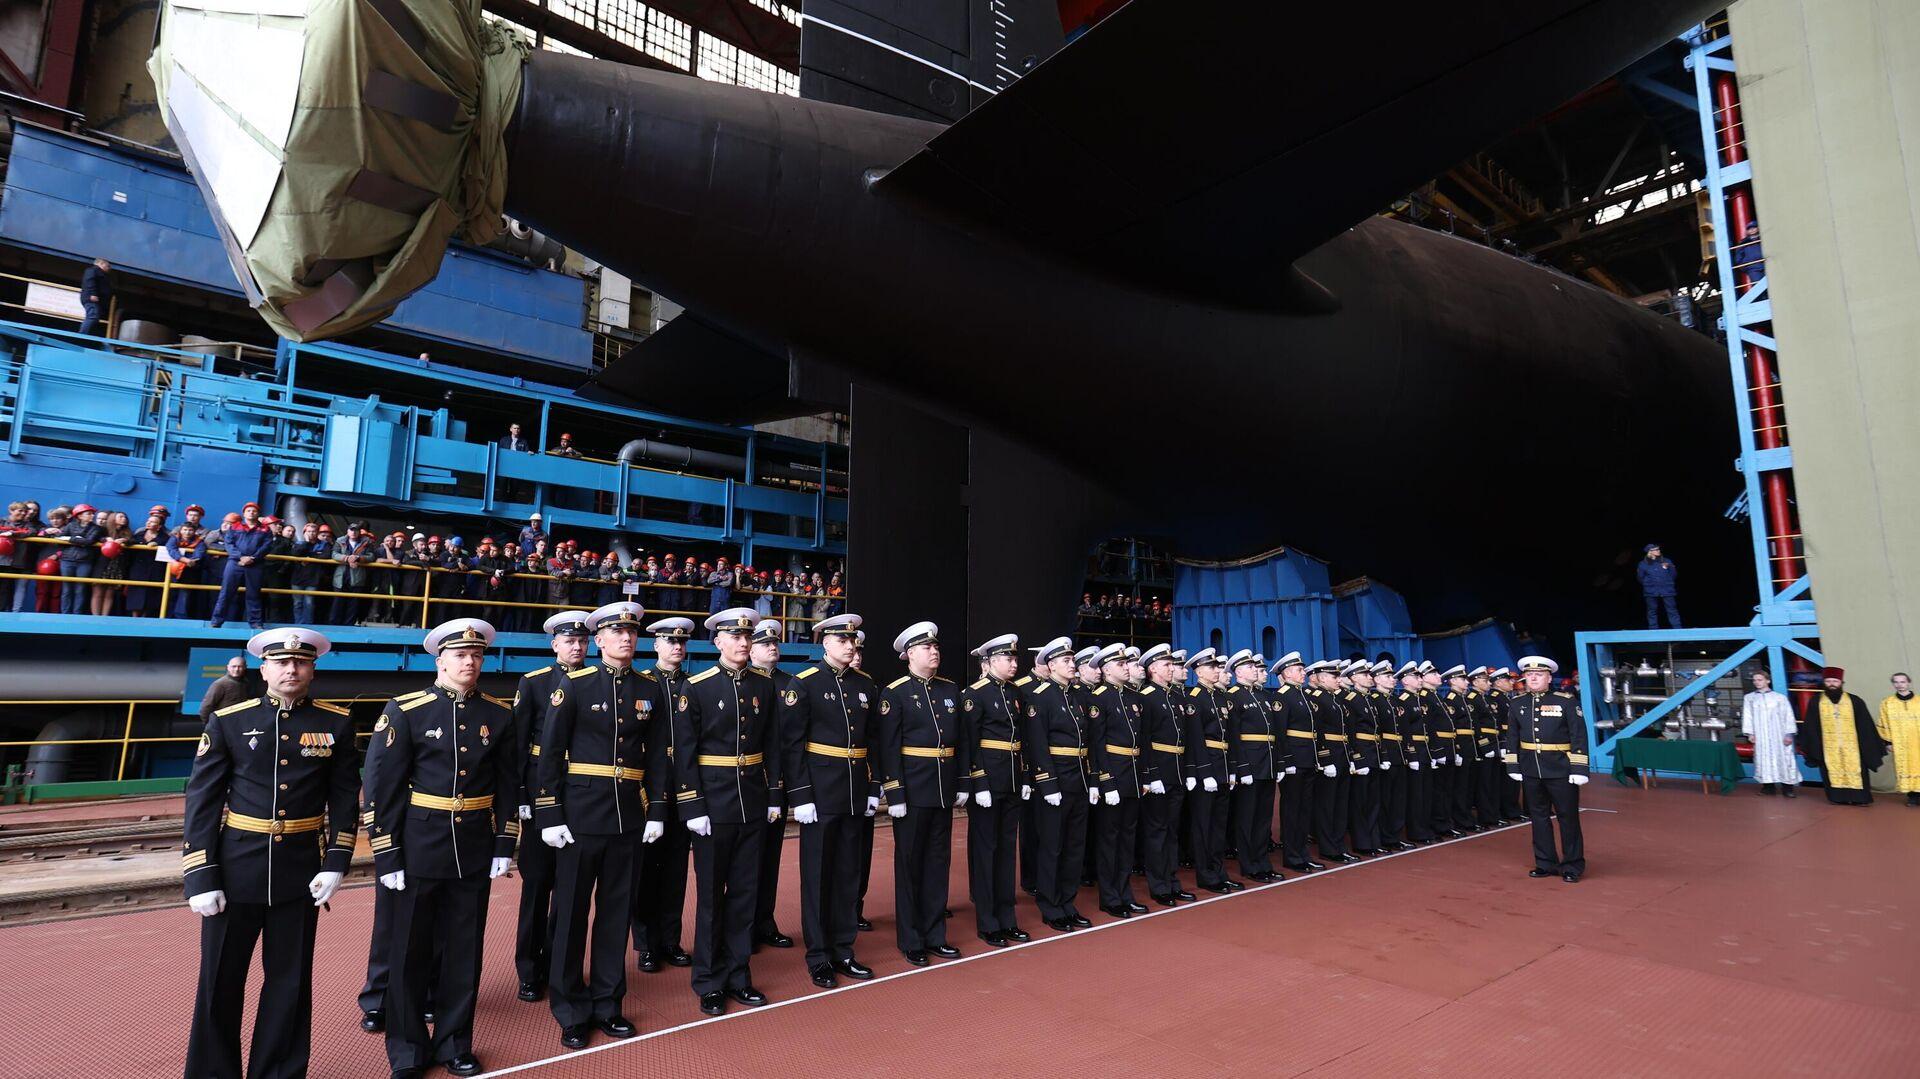 La ceremonia de botadura del submarino nuclear de la cuarta generación Krasnoyarsk - Sputnik Mundo, 1920, 31.07.2021